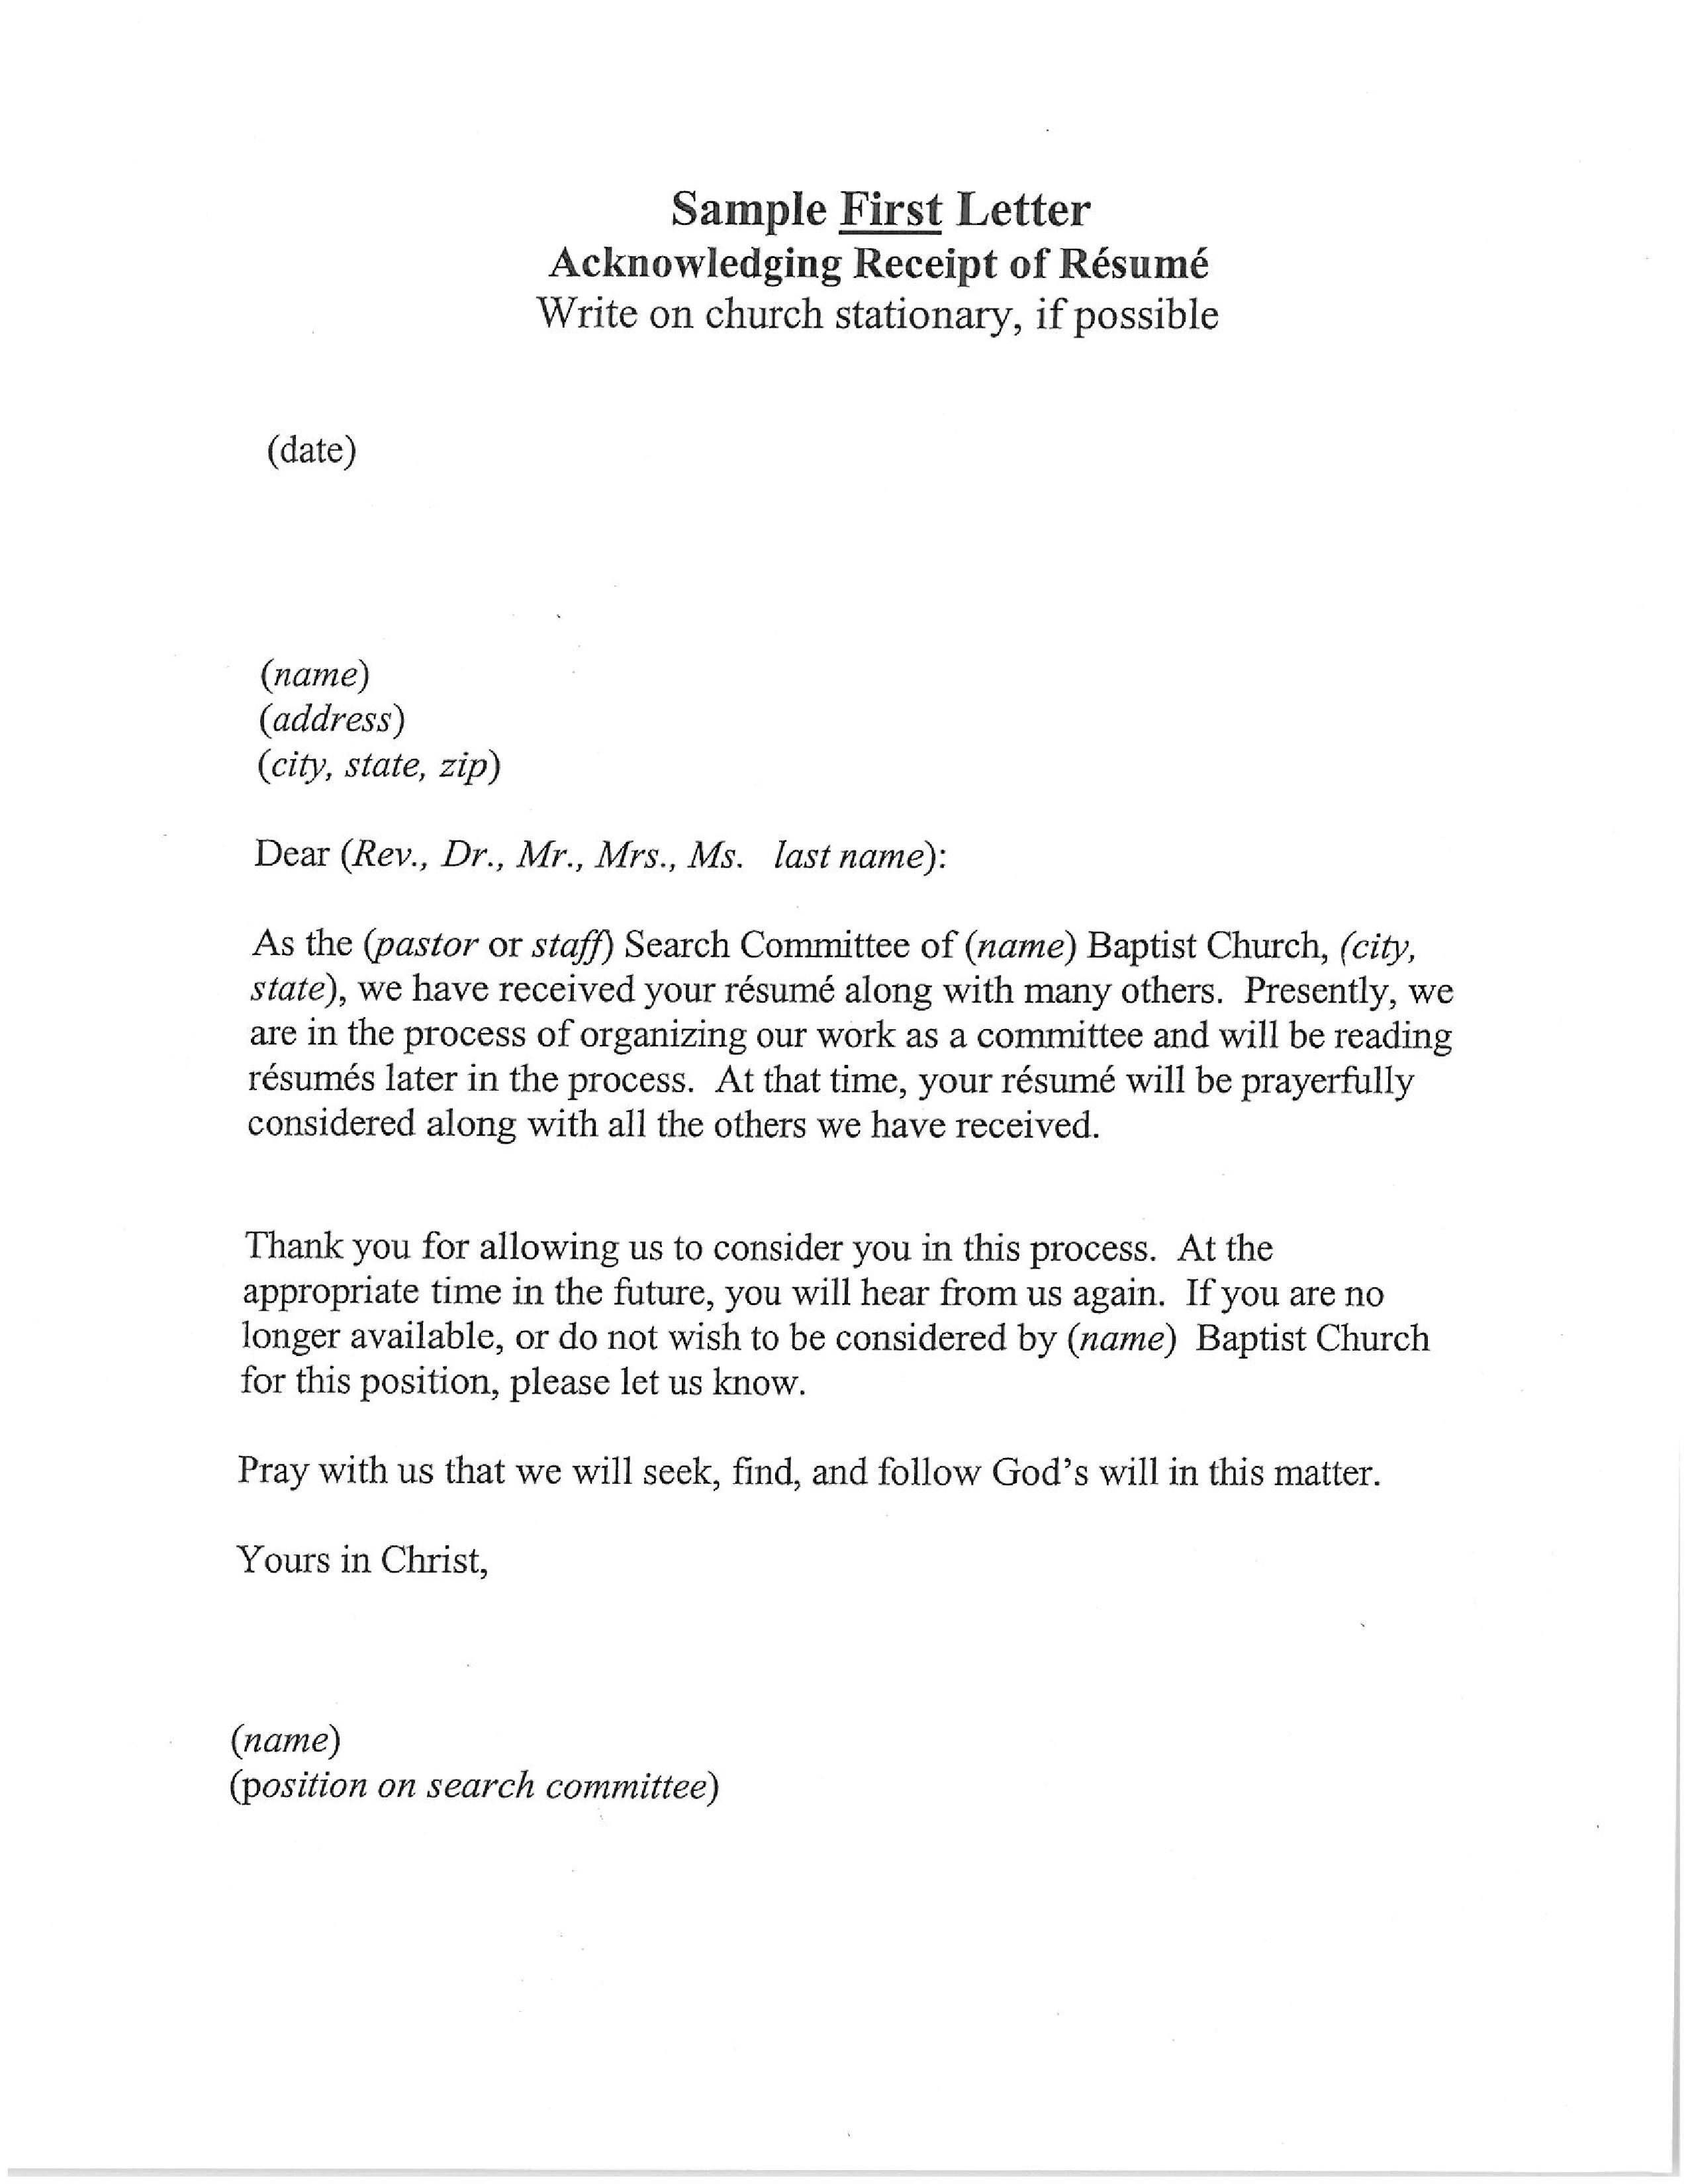 Acknowledgement Receipt Letter Template.Resume Acknowledgement Receipt Letter Templates At